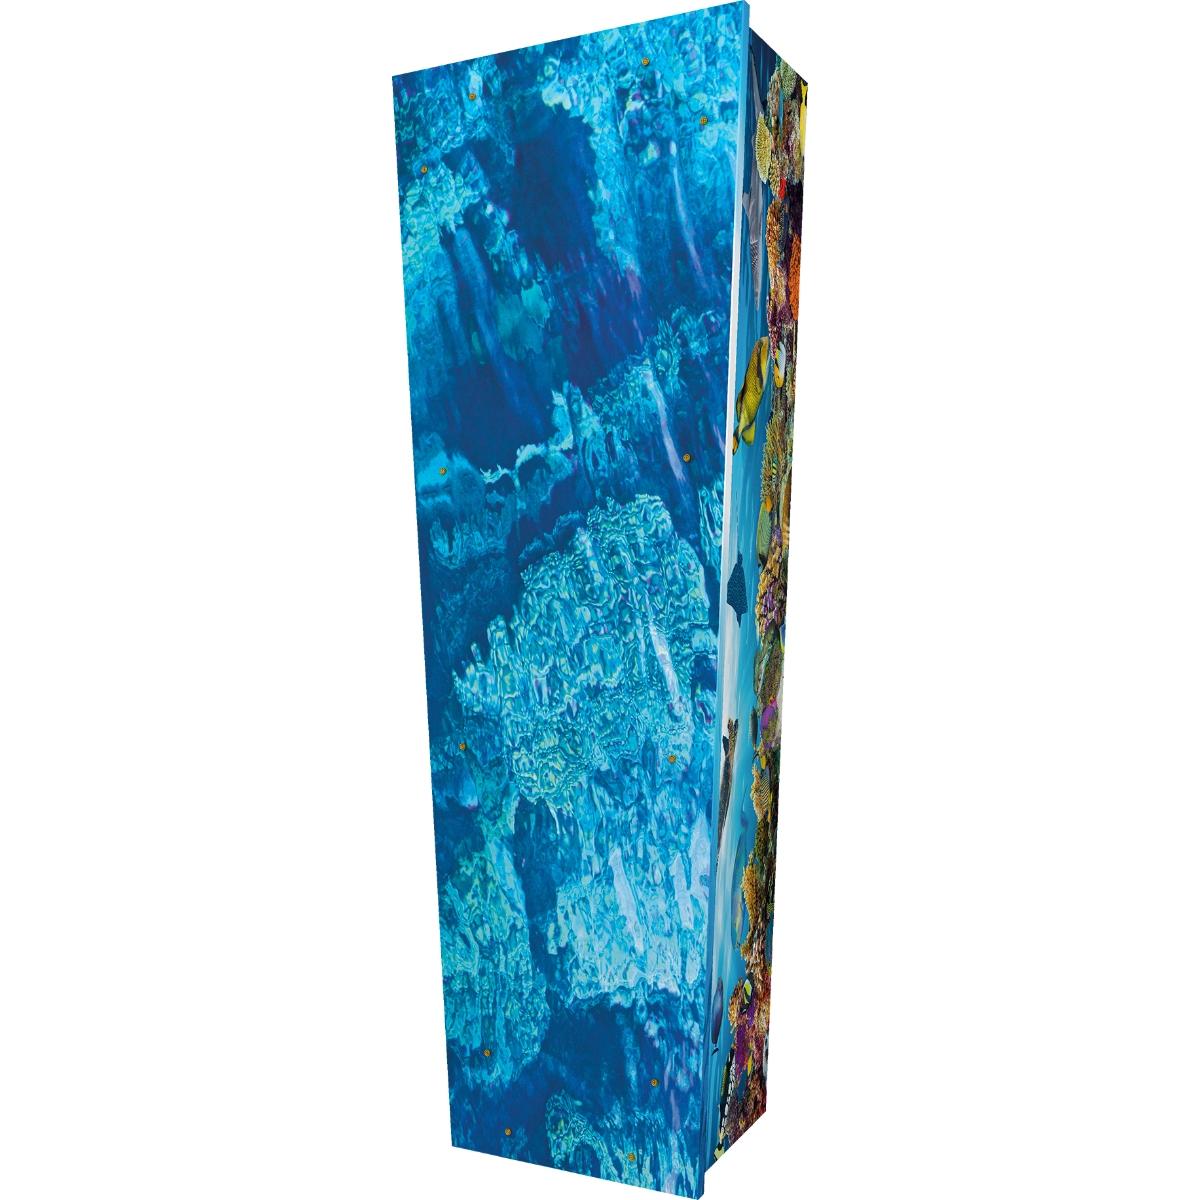 Undersea Coffin